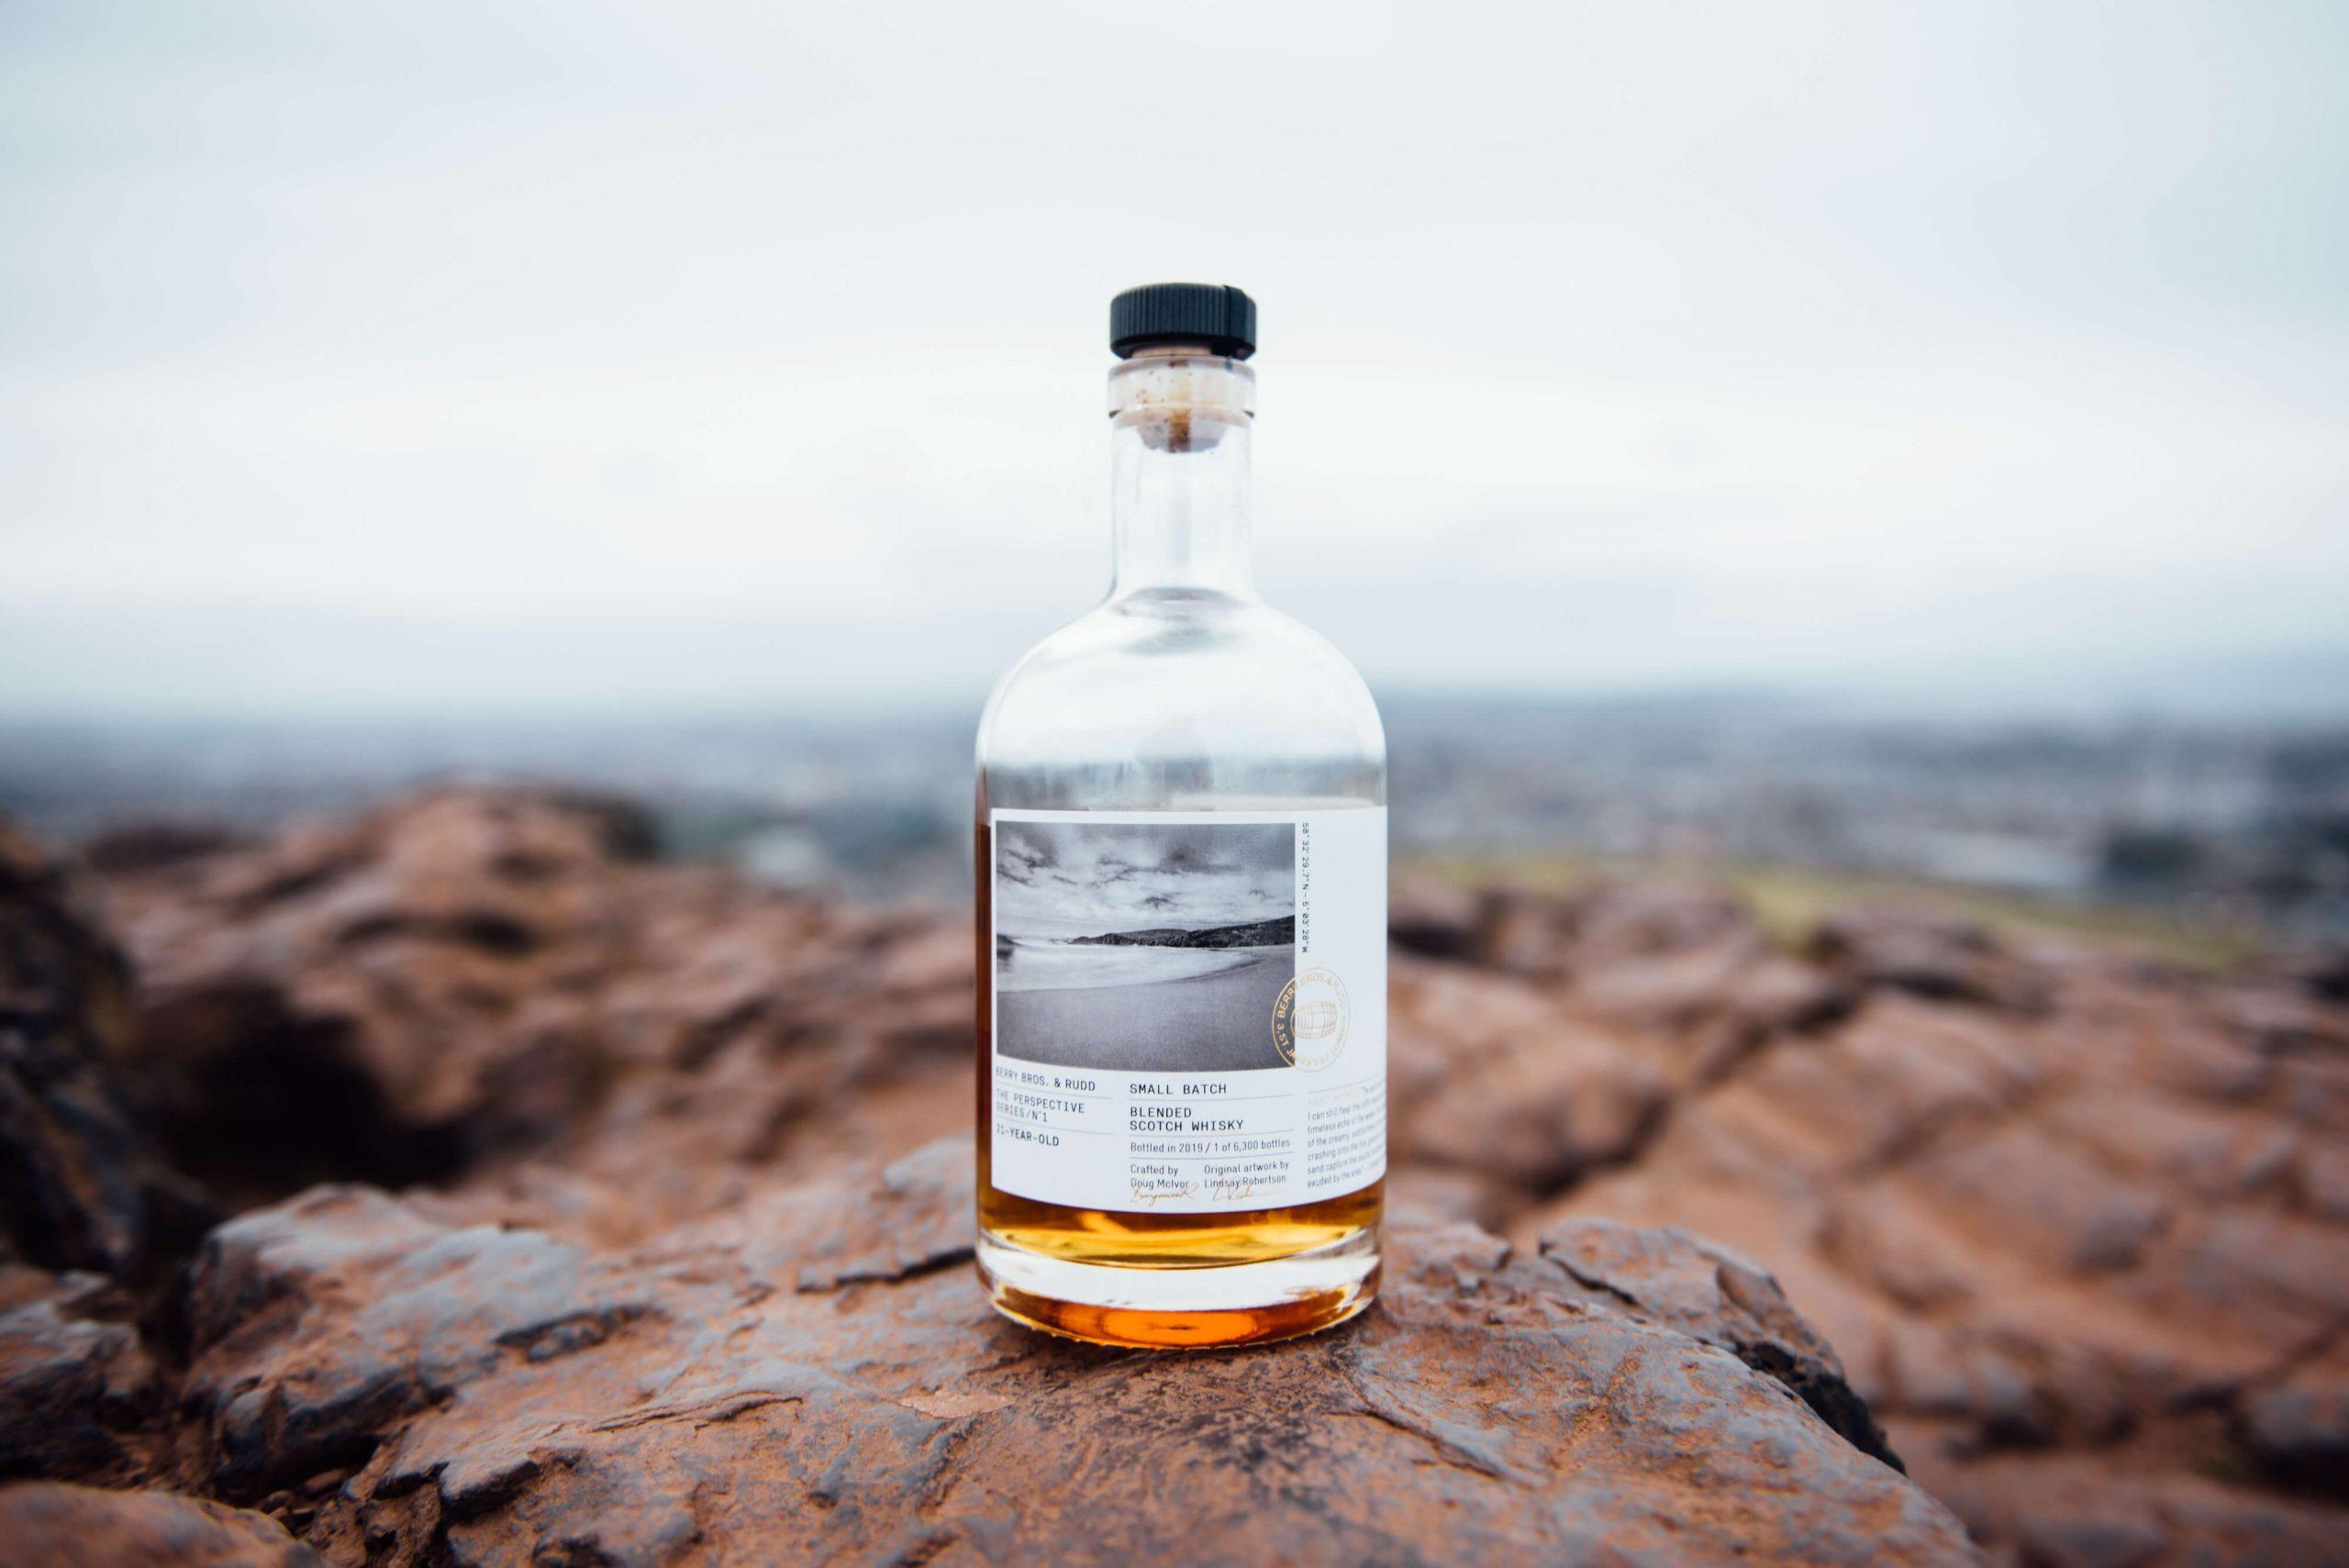 whisky_trip-arthurs_seat-edinburgh-ryanjohnstonco-45